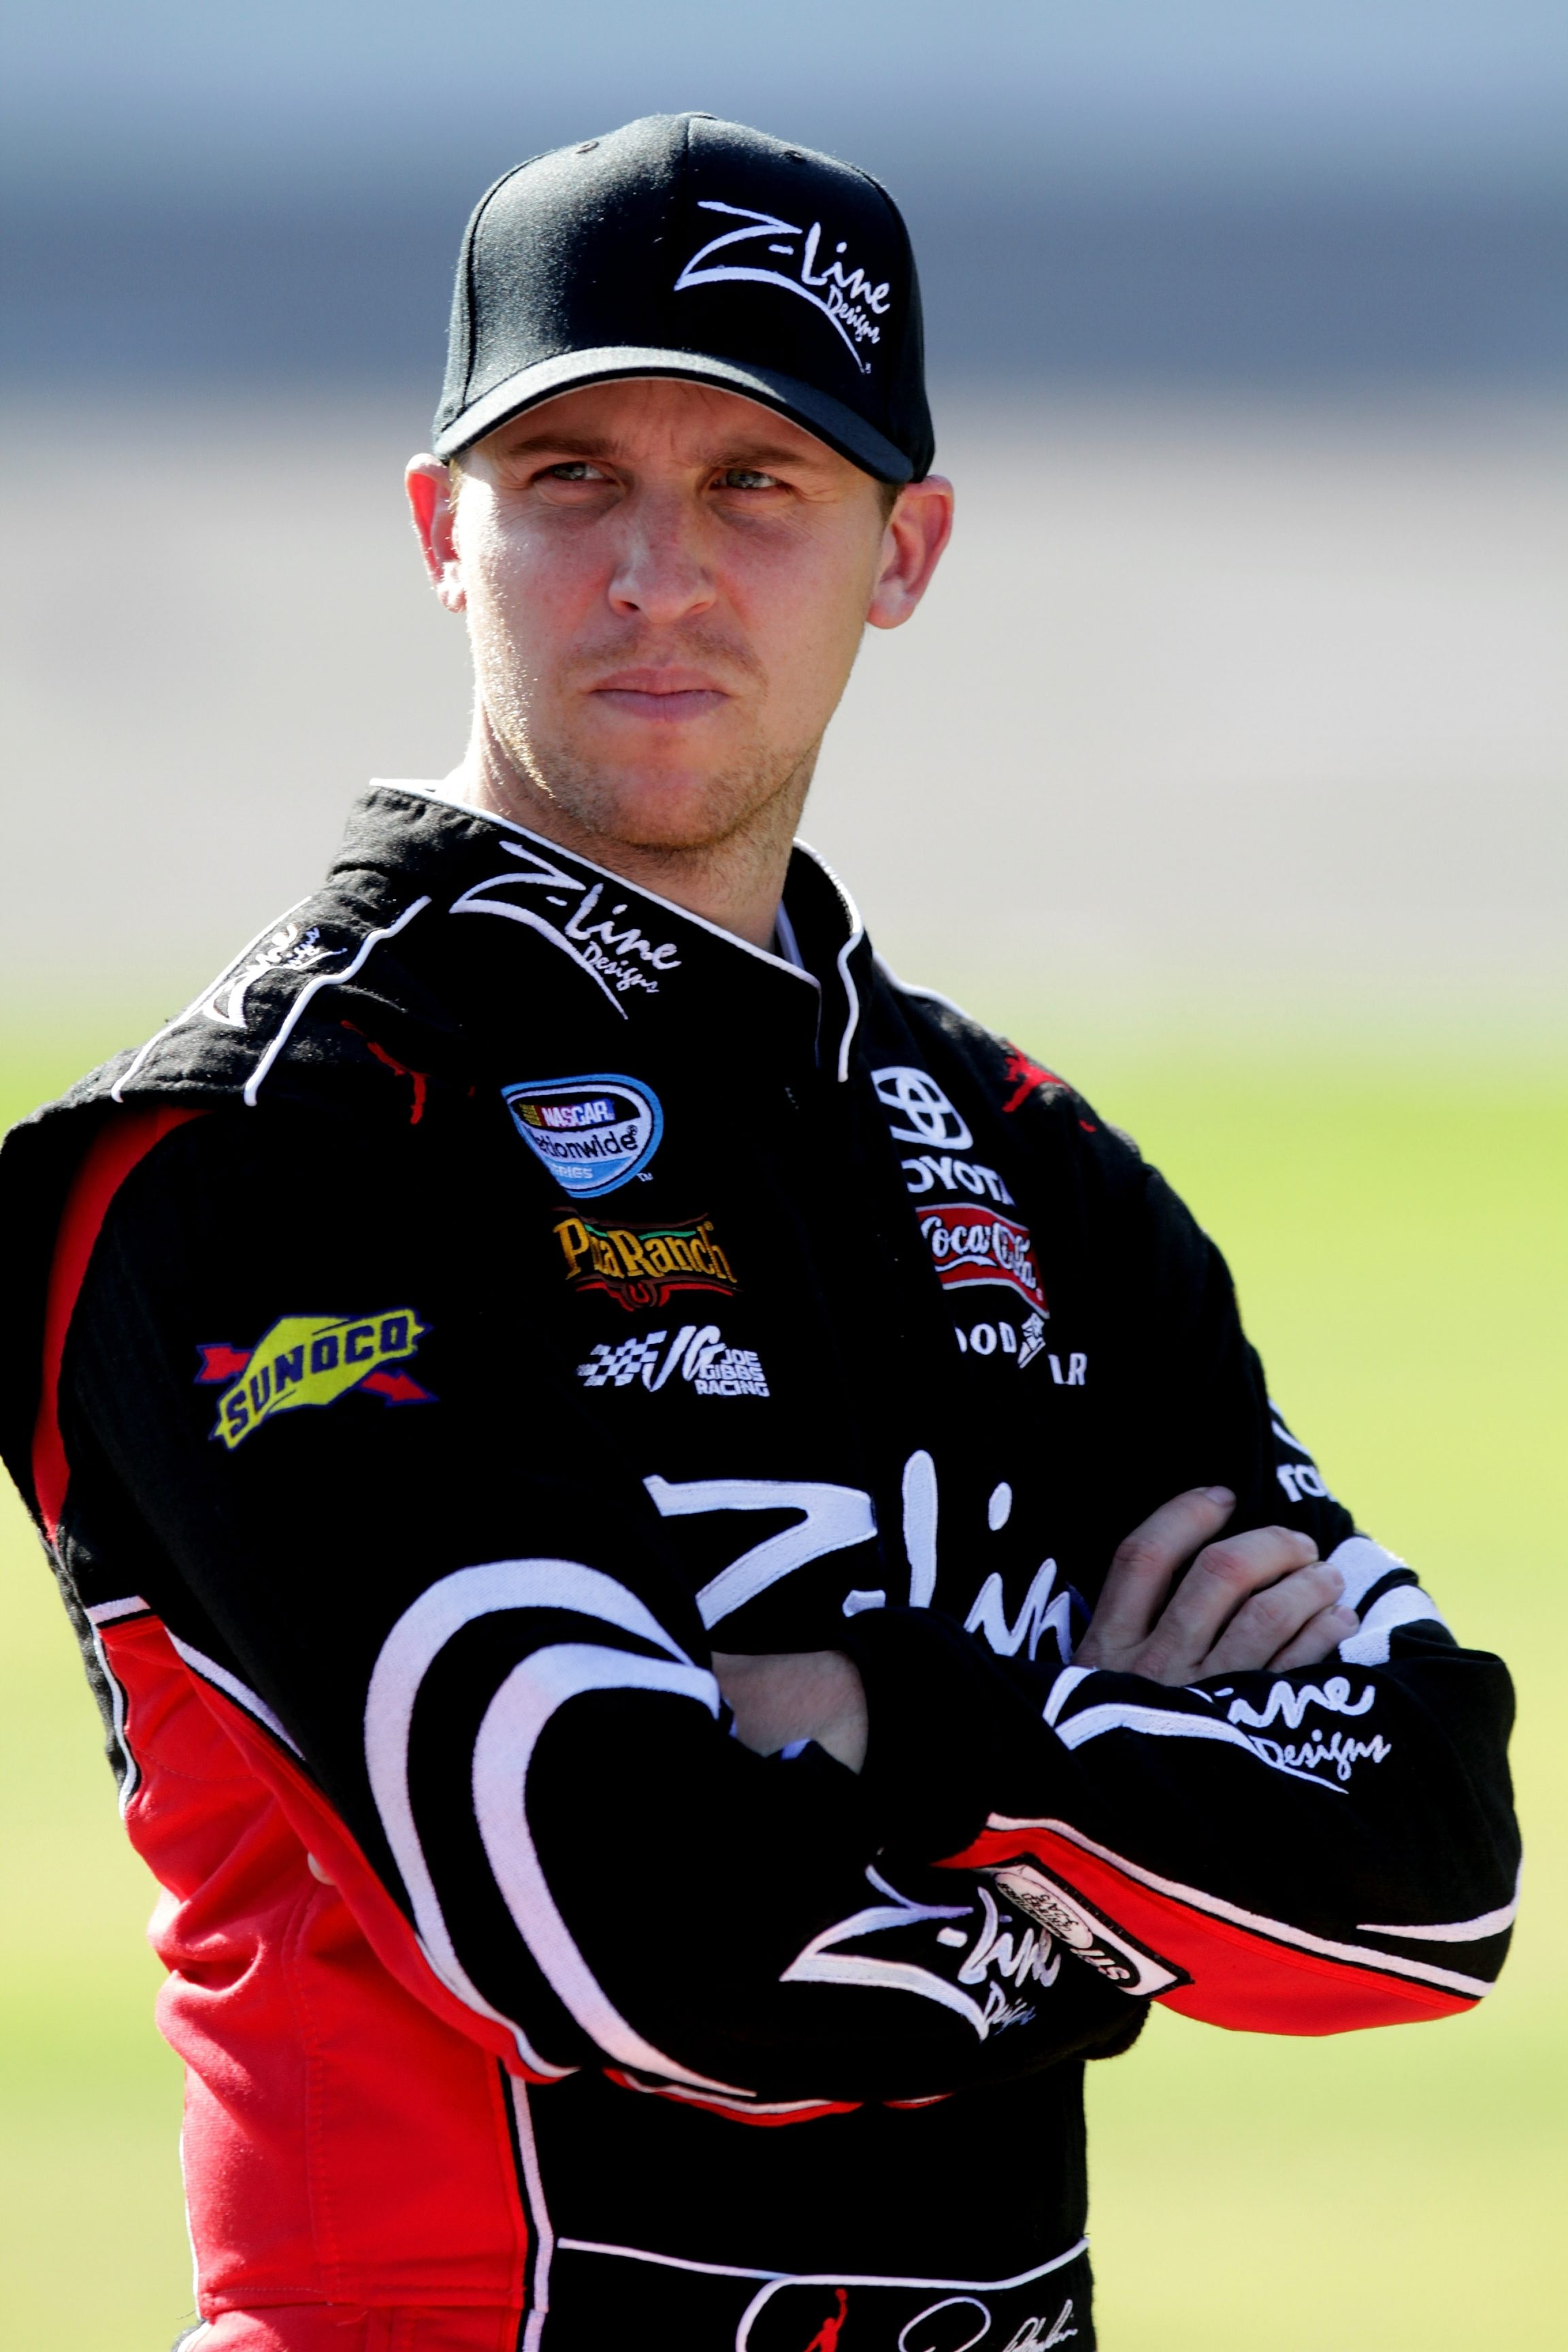 Denny Hamlin won last year's event at Bristol Motor Speedway.